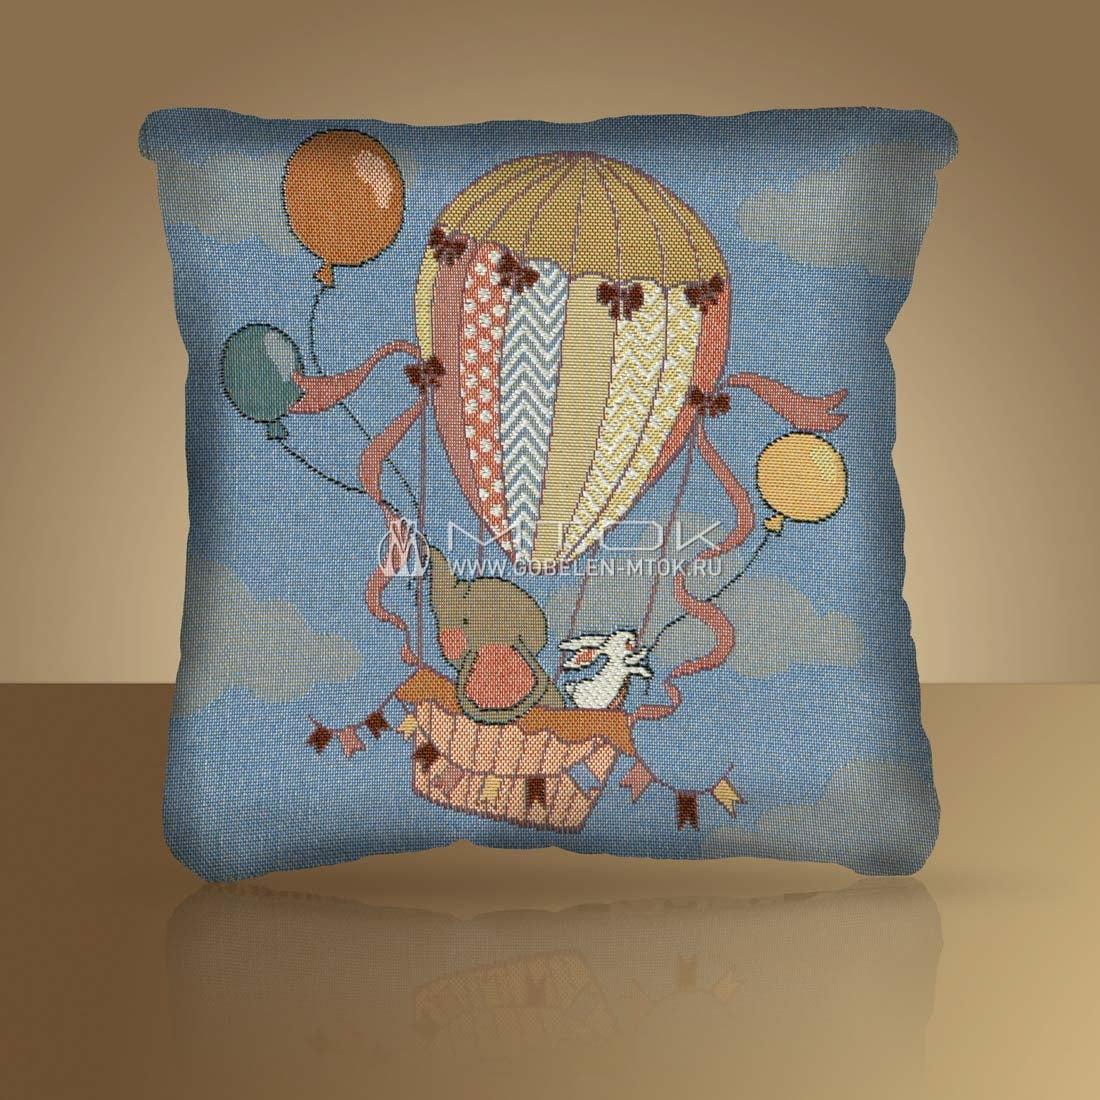 "Декоративная наволочка на подушку с детским рисунком ""Воздушный шар"""